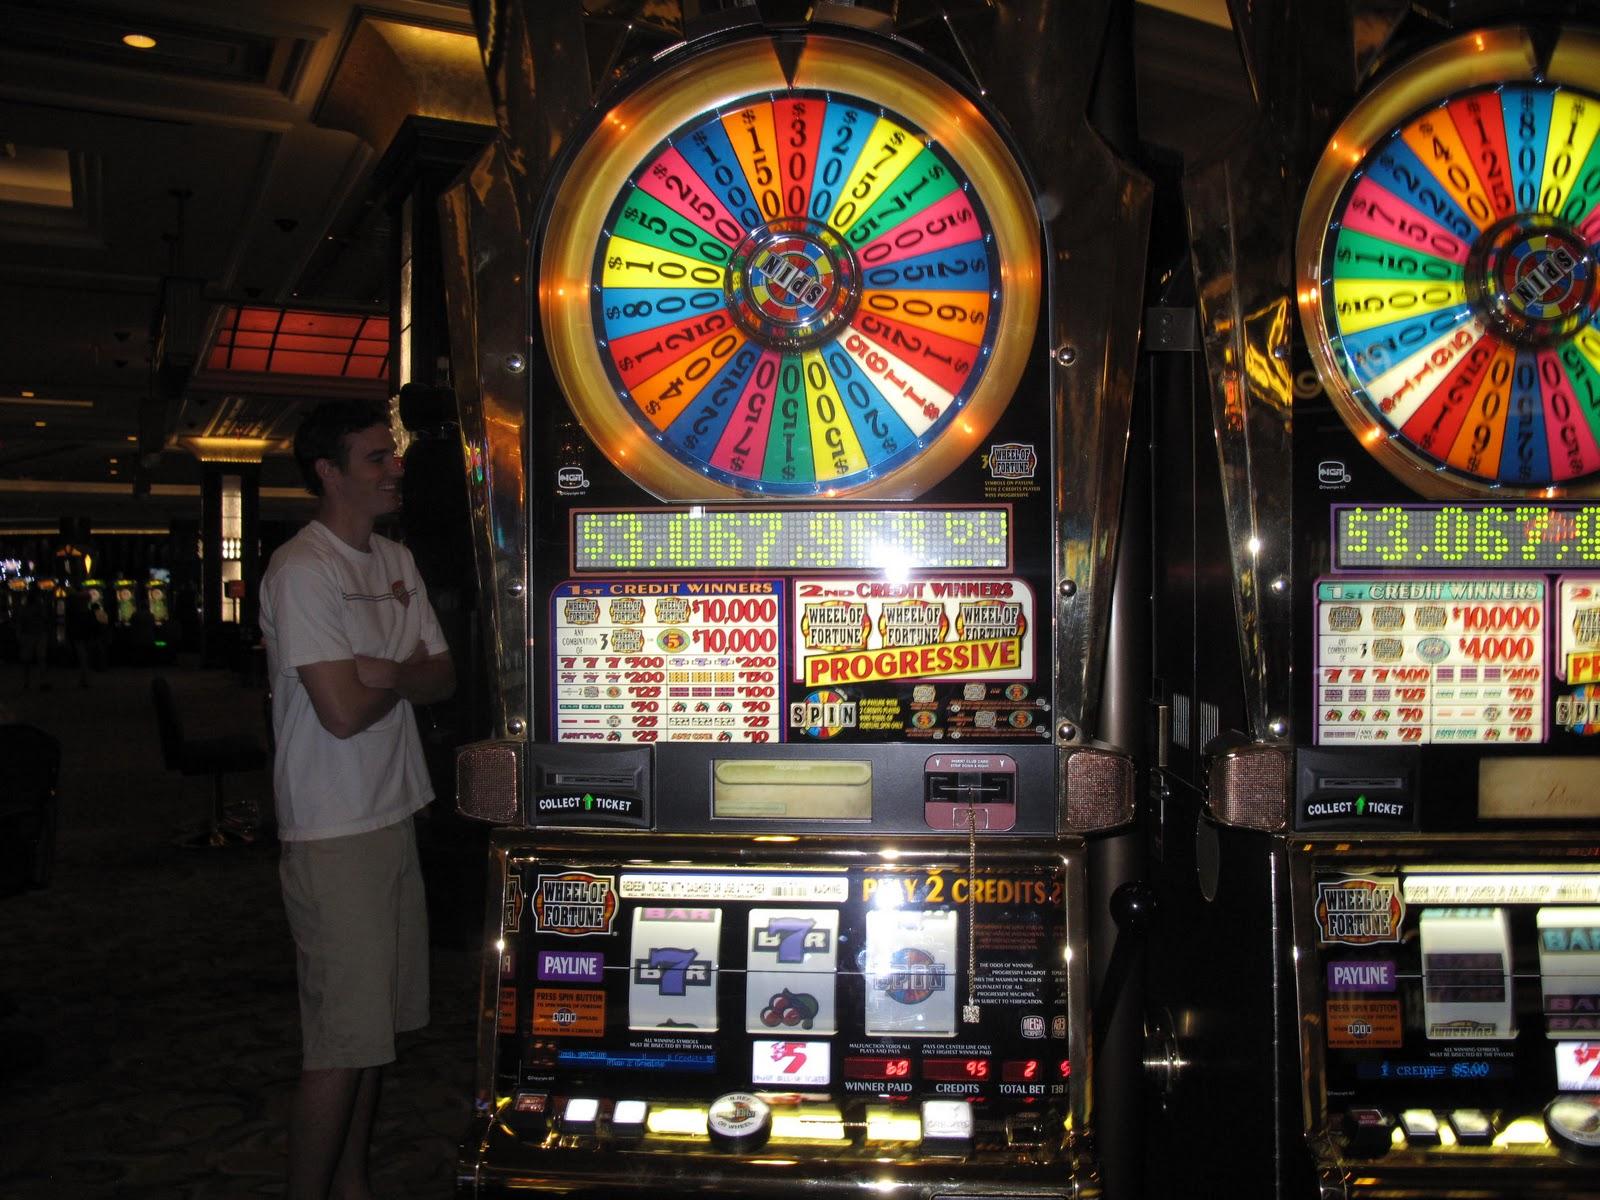 wheel of fortune 5 dollar machine lexington